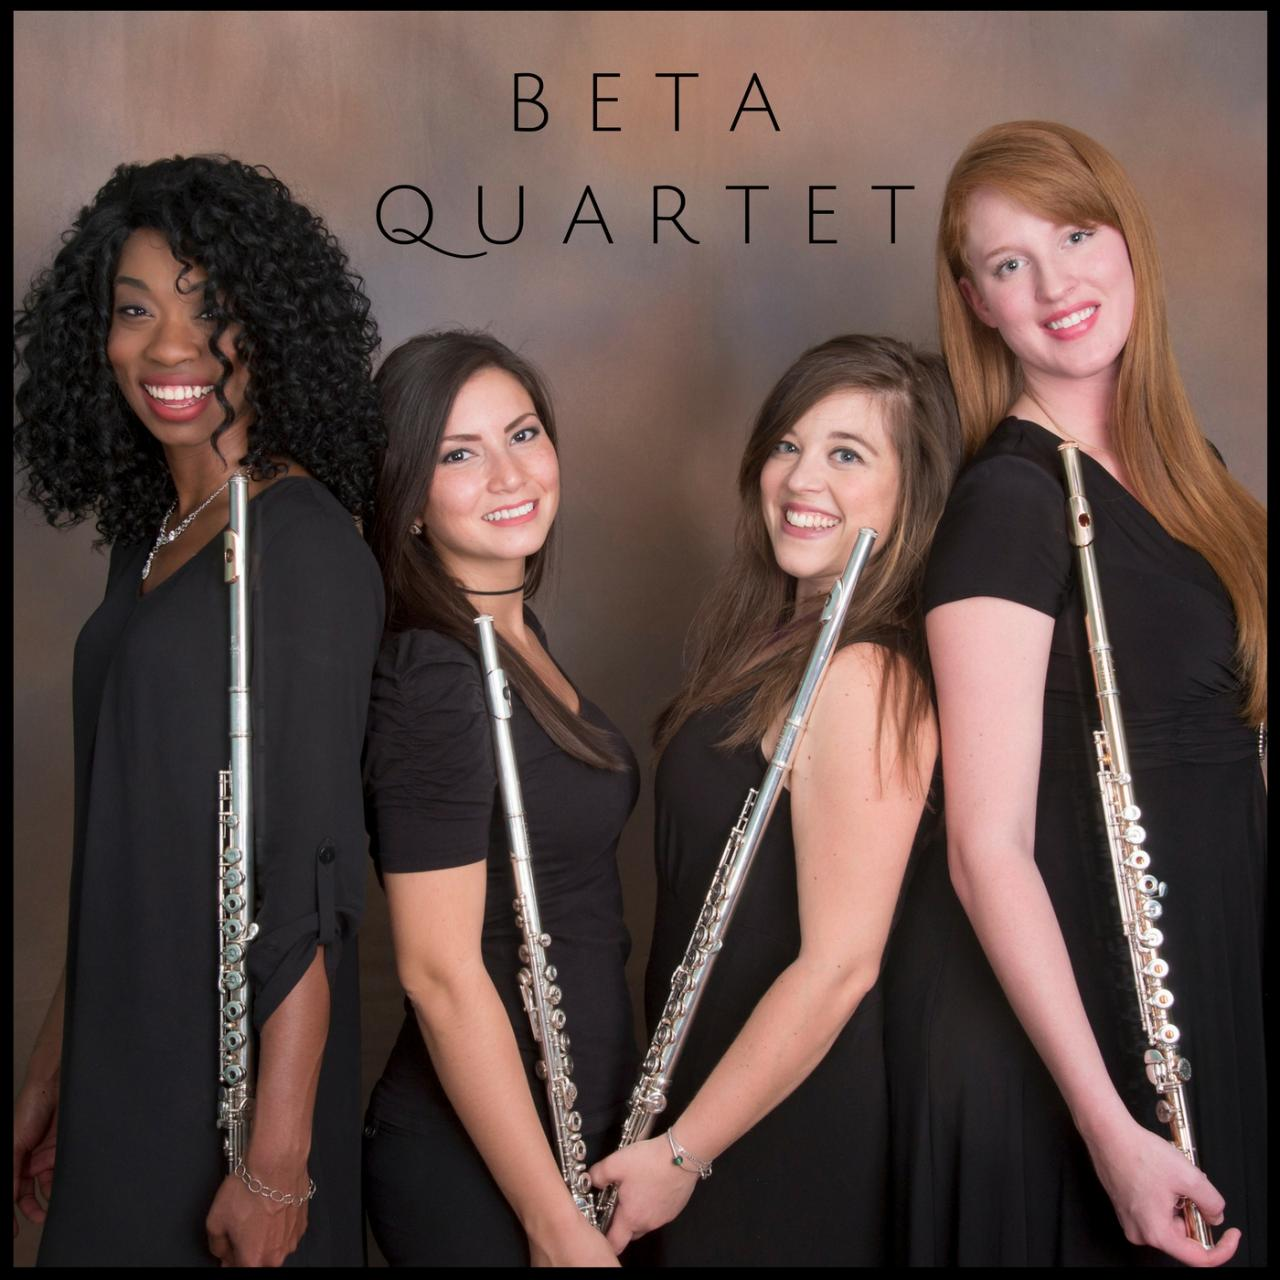 BETA Quartet Releases Debut Album - Click Here